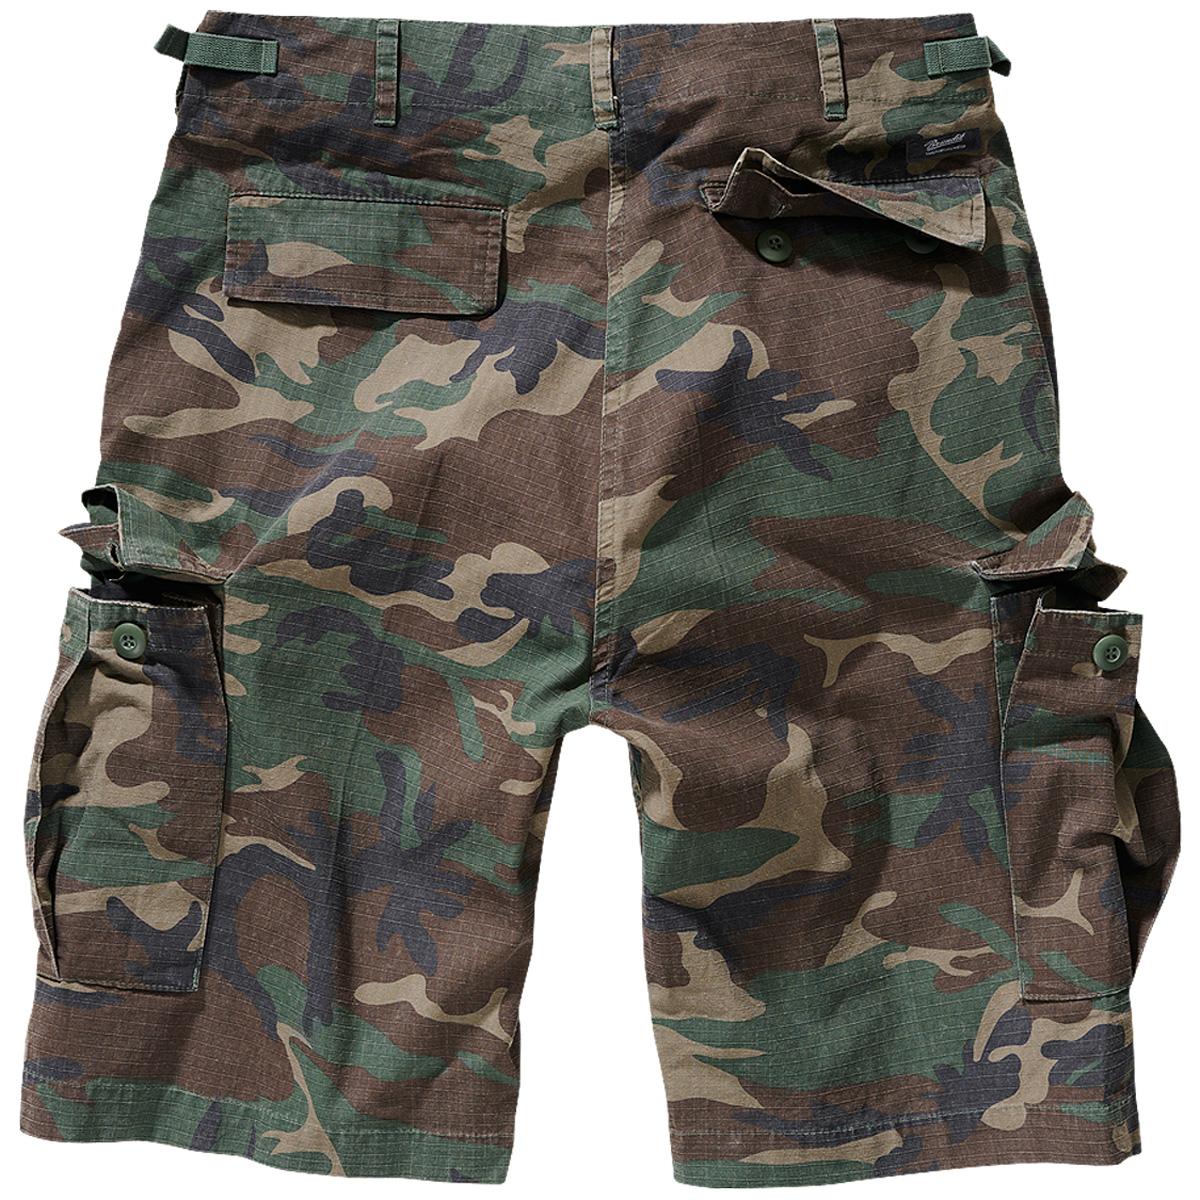 Brandit-BDU-Ripstop-Shorts-S-7XL-Army-Cargo-Bermuda-Outdoor-Short-kurze-Hose miniatura 15